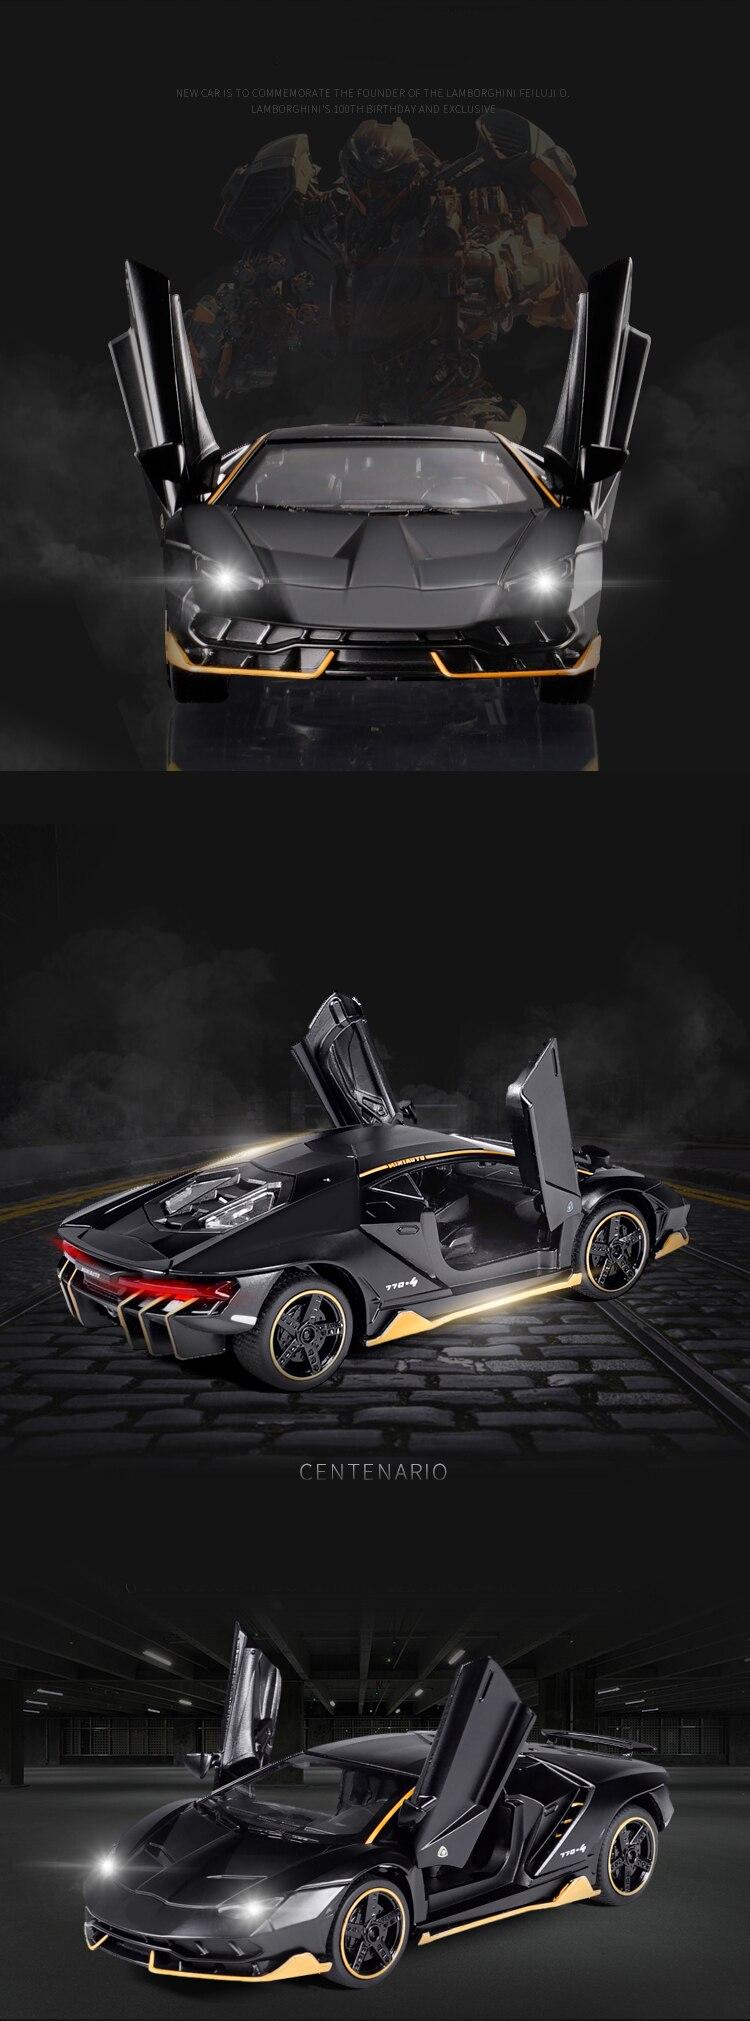 Centenario LP700-4 High Quality Model Toy Car 15.5x6.5x4.3 cm 36